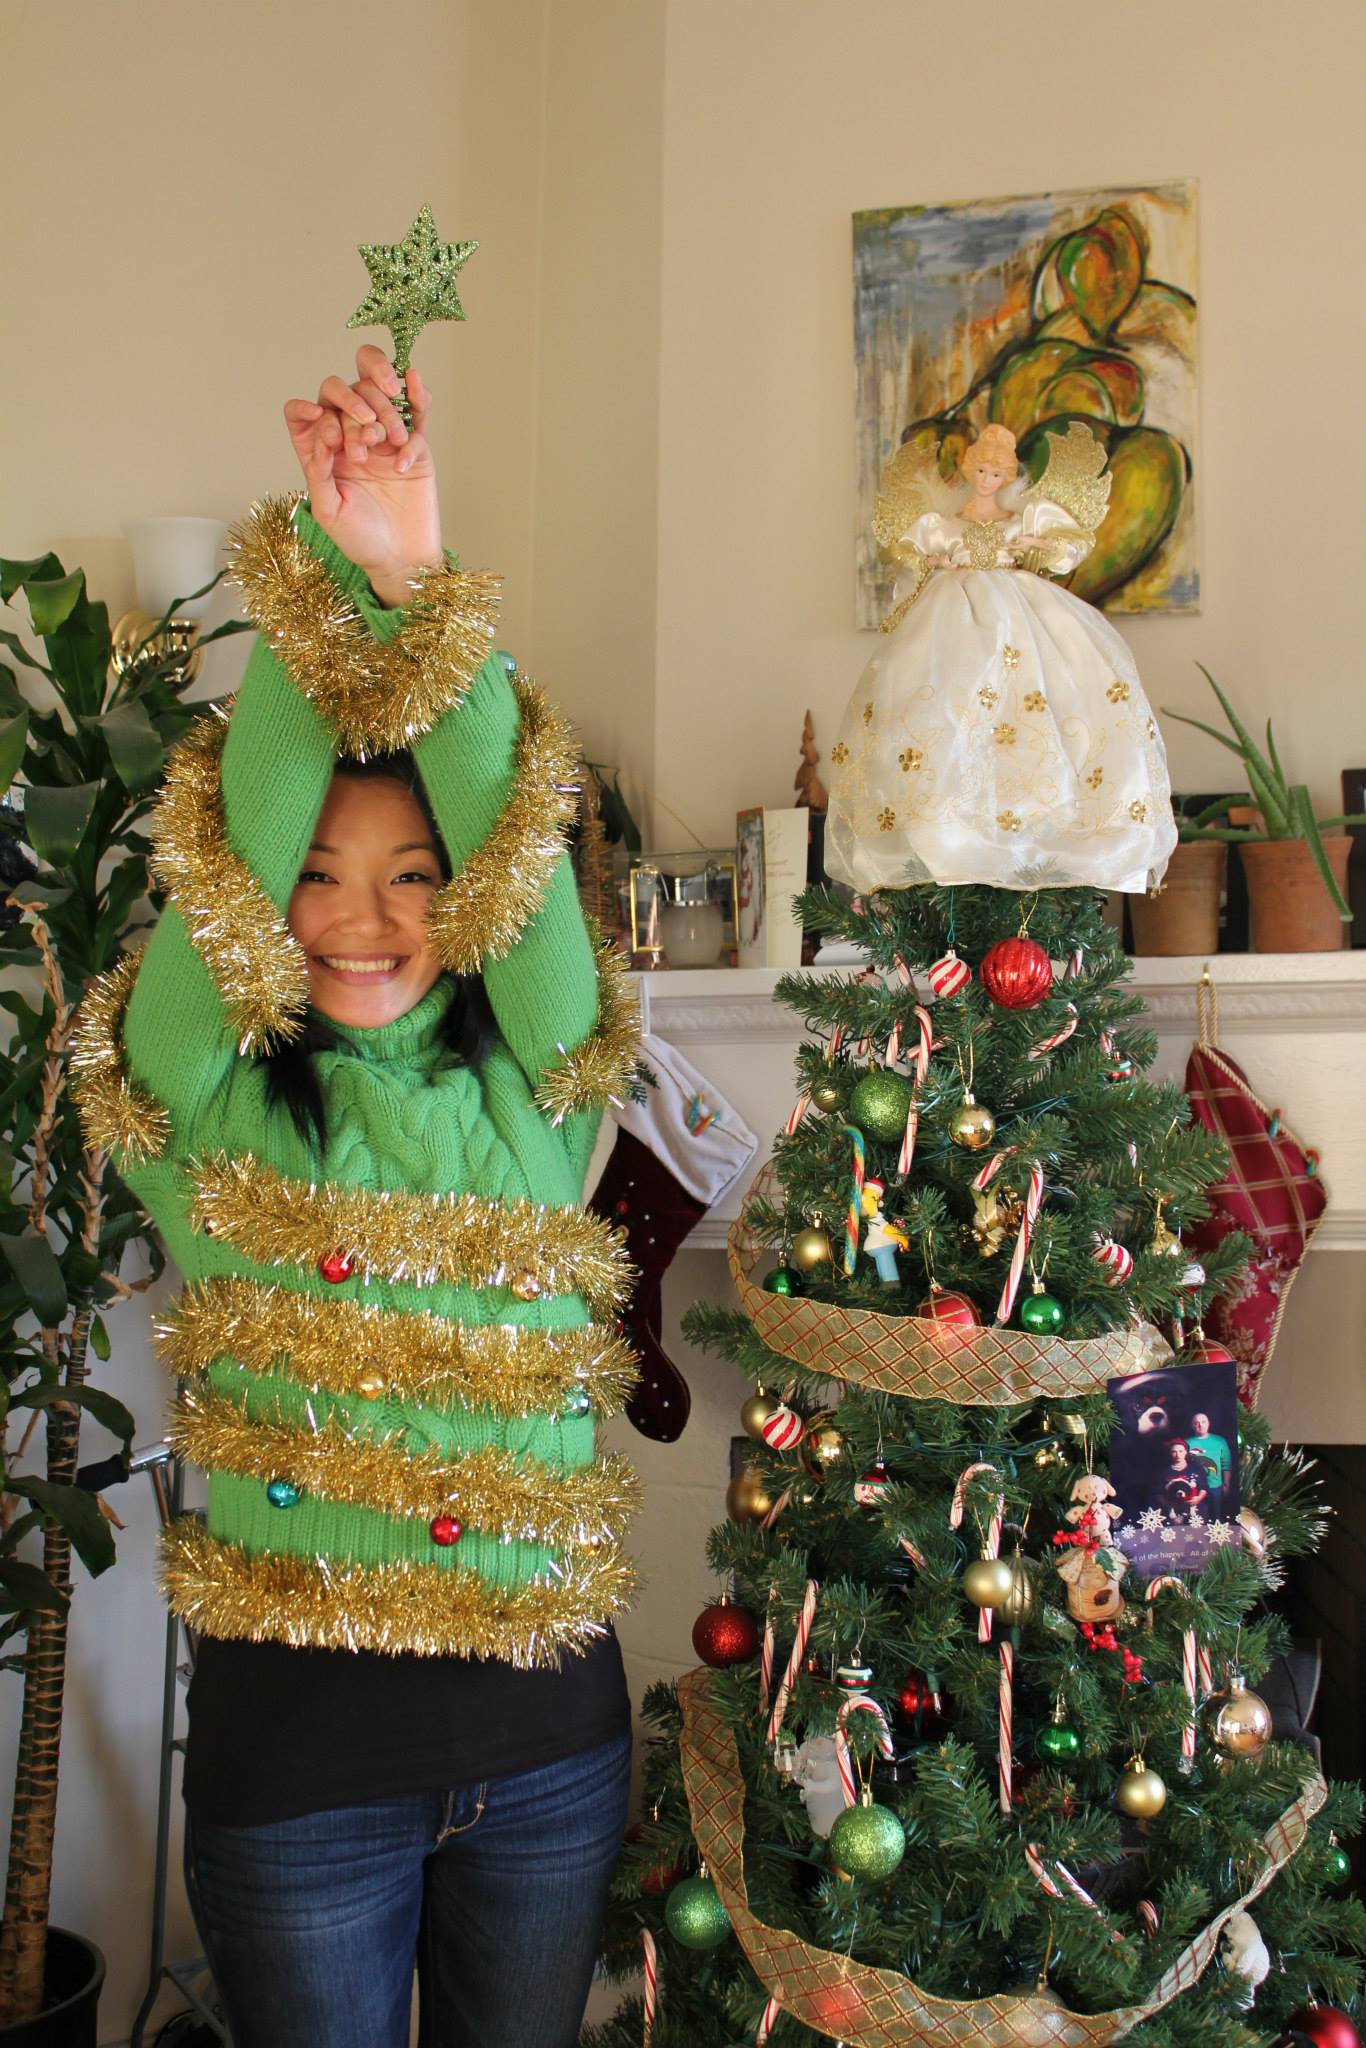 Liz Enjoying the Holidays